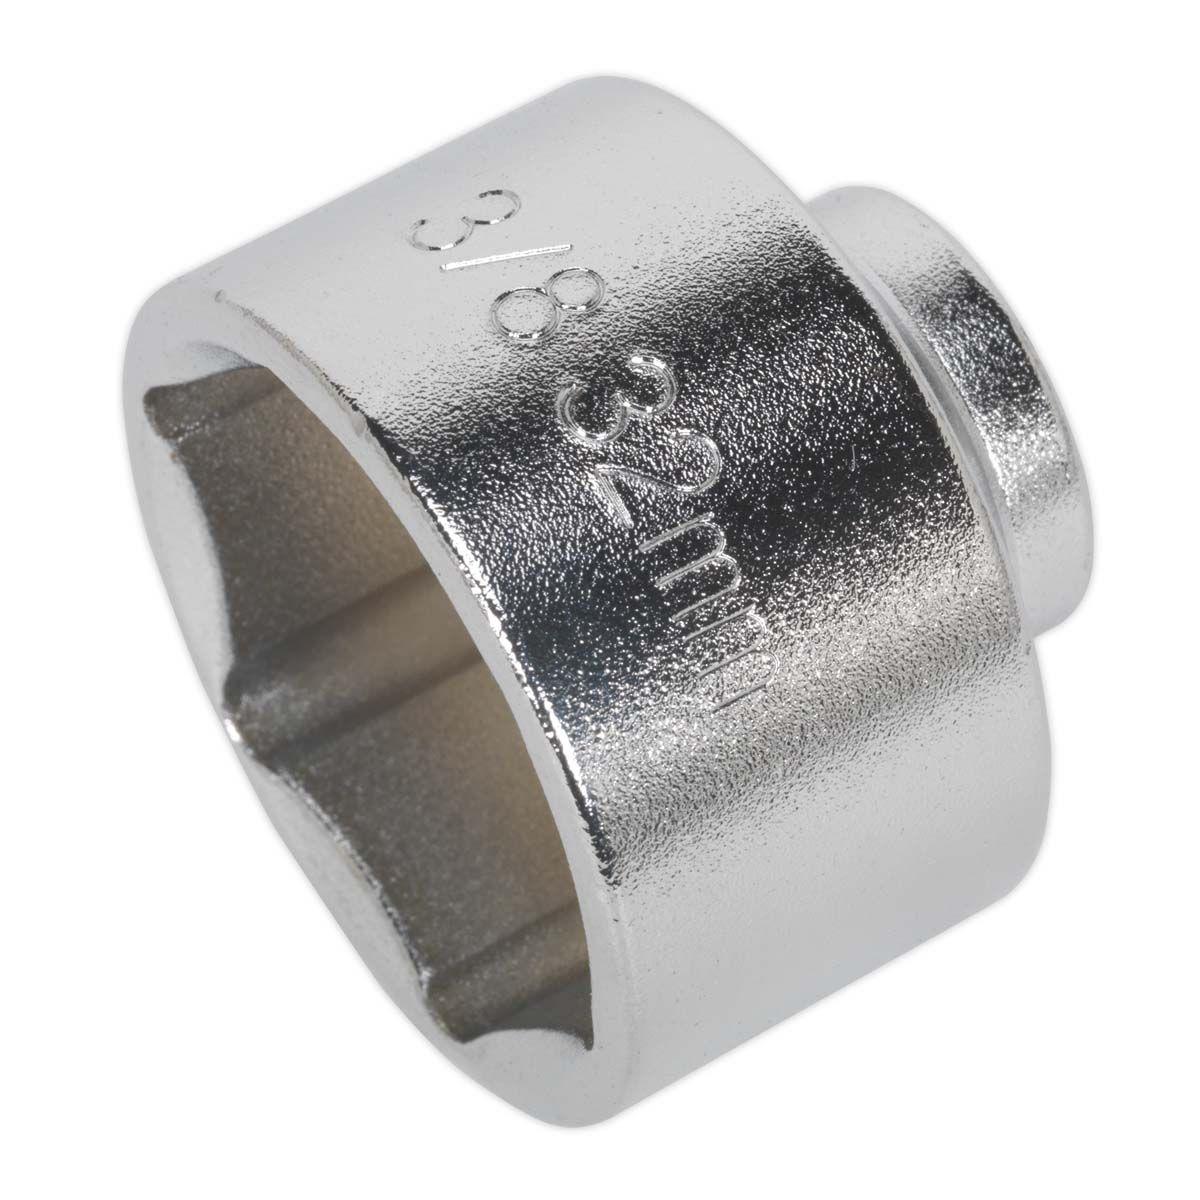 "Sealey Low Profile Oil Filter Socket 32mm 3/8""Sq Drive"